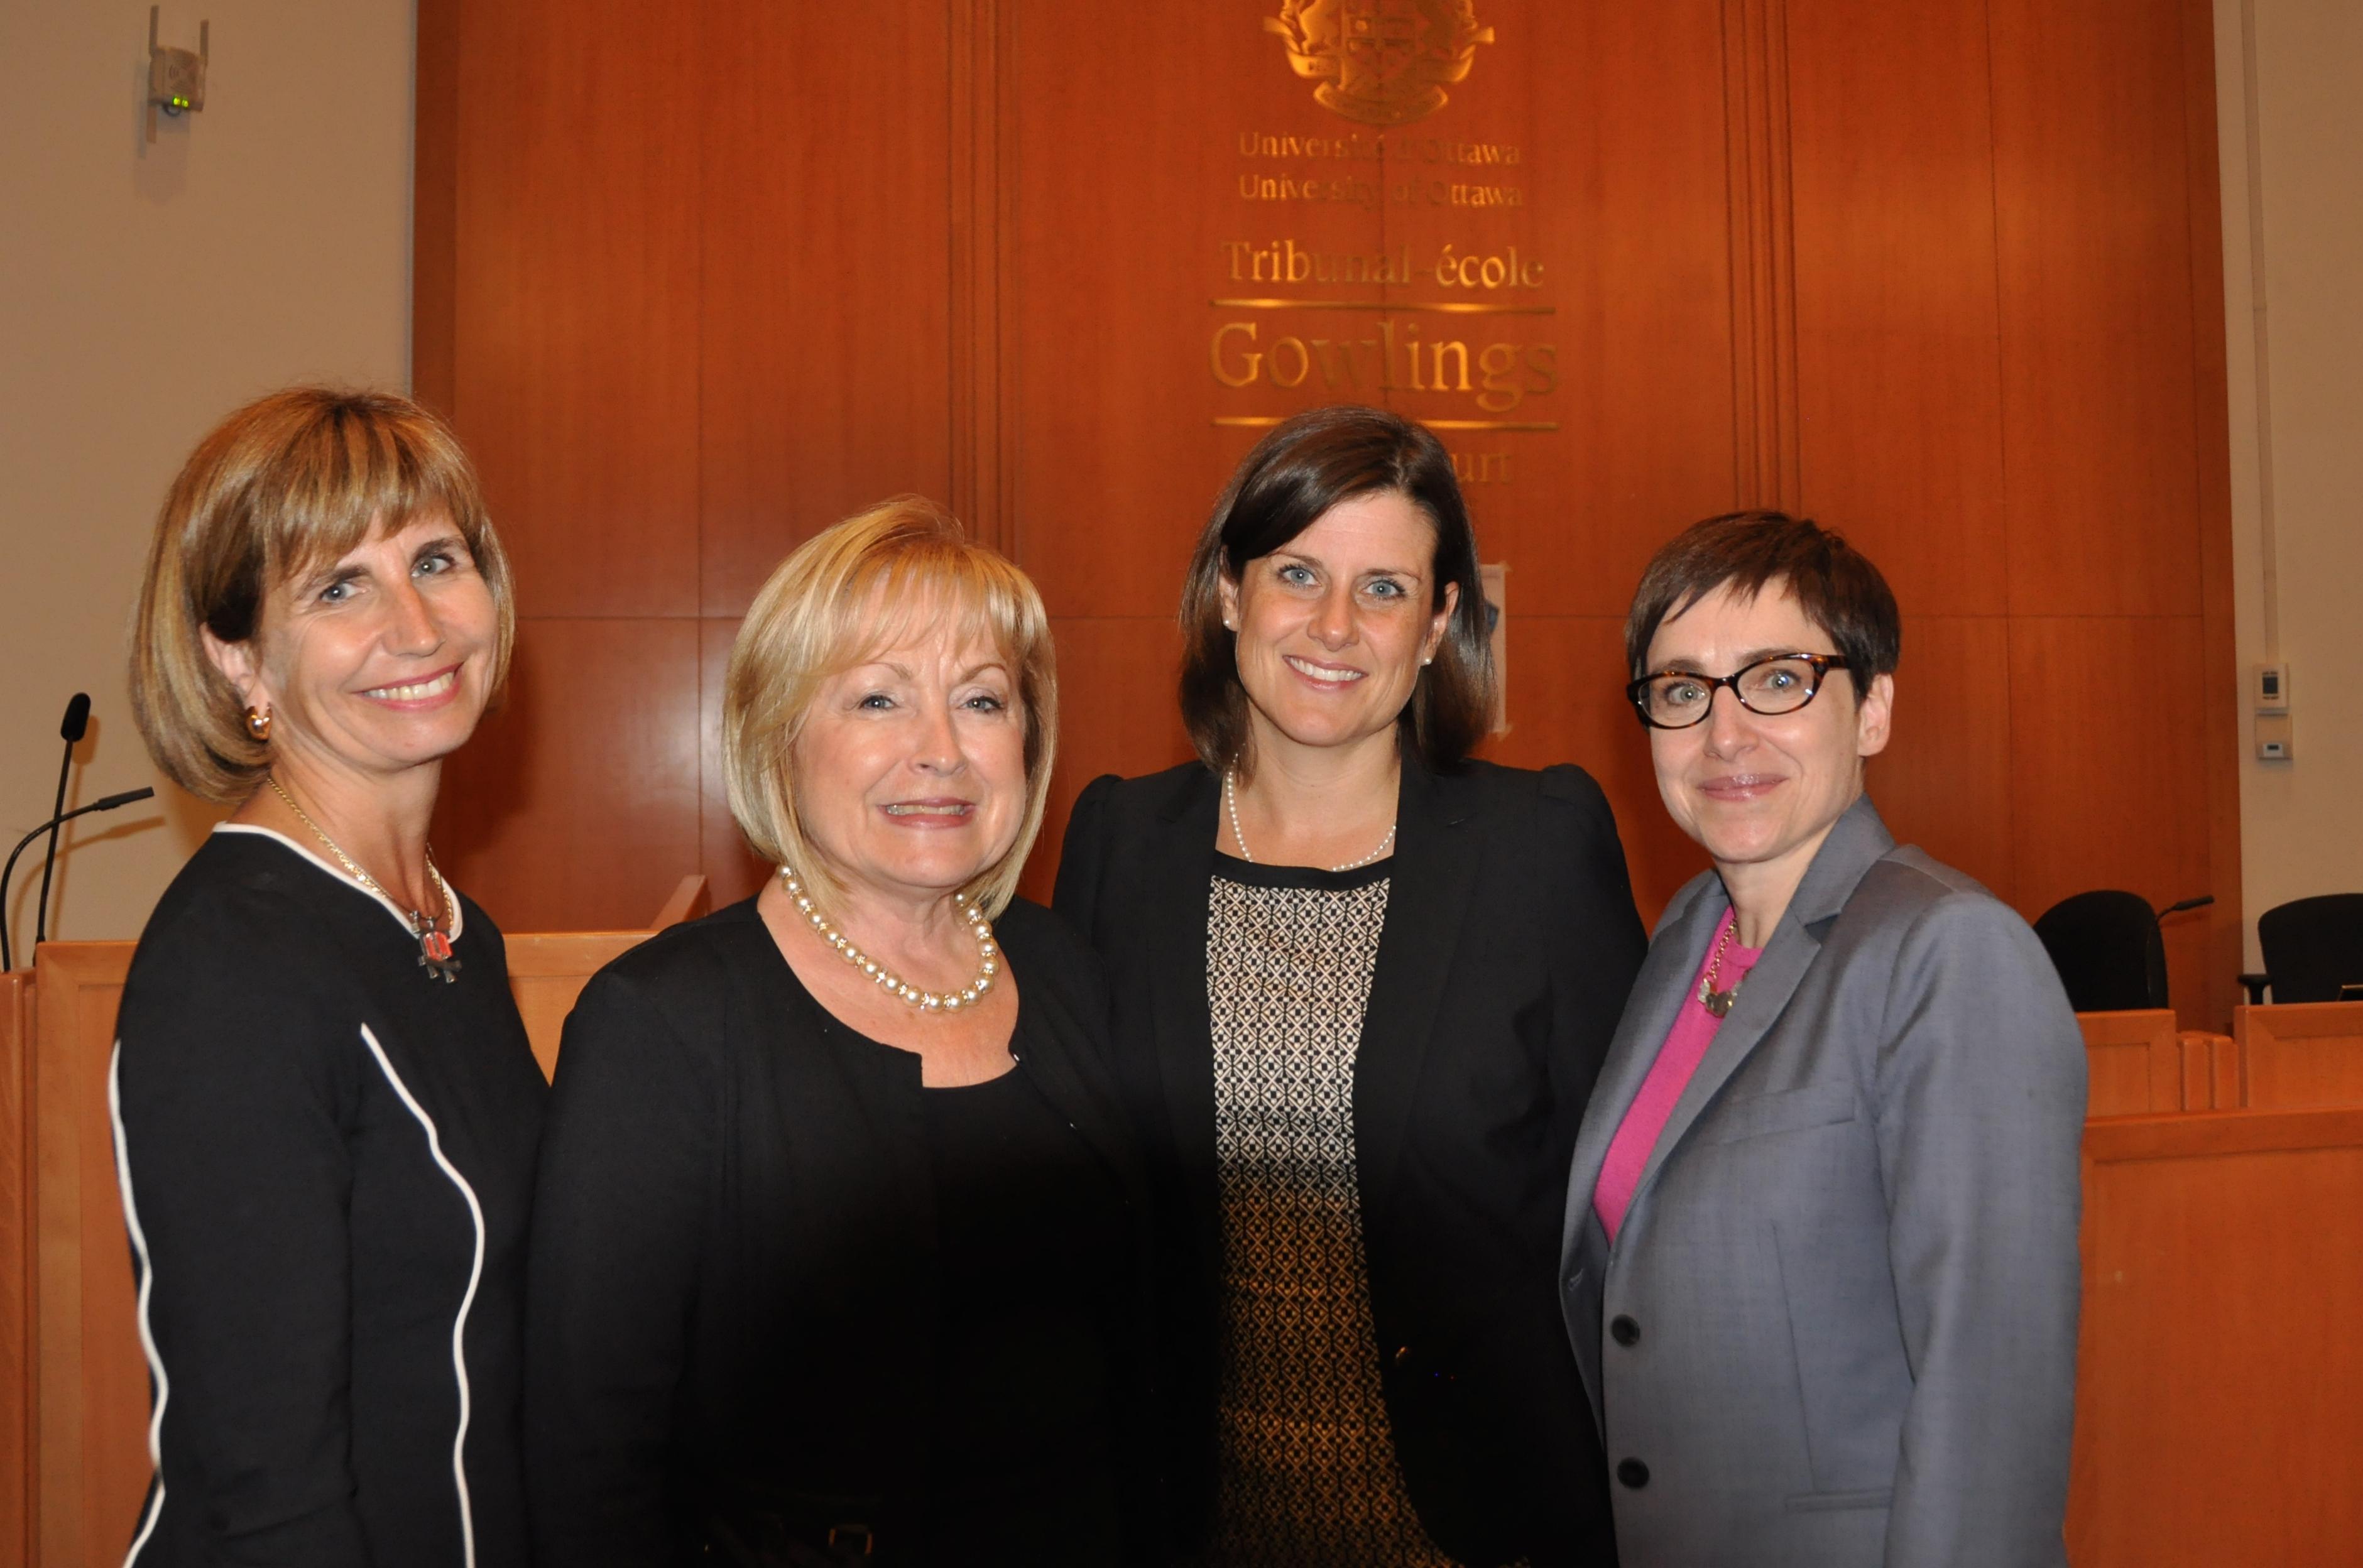 Nathalie Des Rosiers, Madeleine Meilleur, Stéphanie Vallée, Céline Lévesque